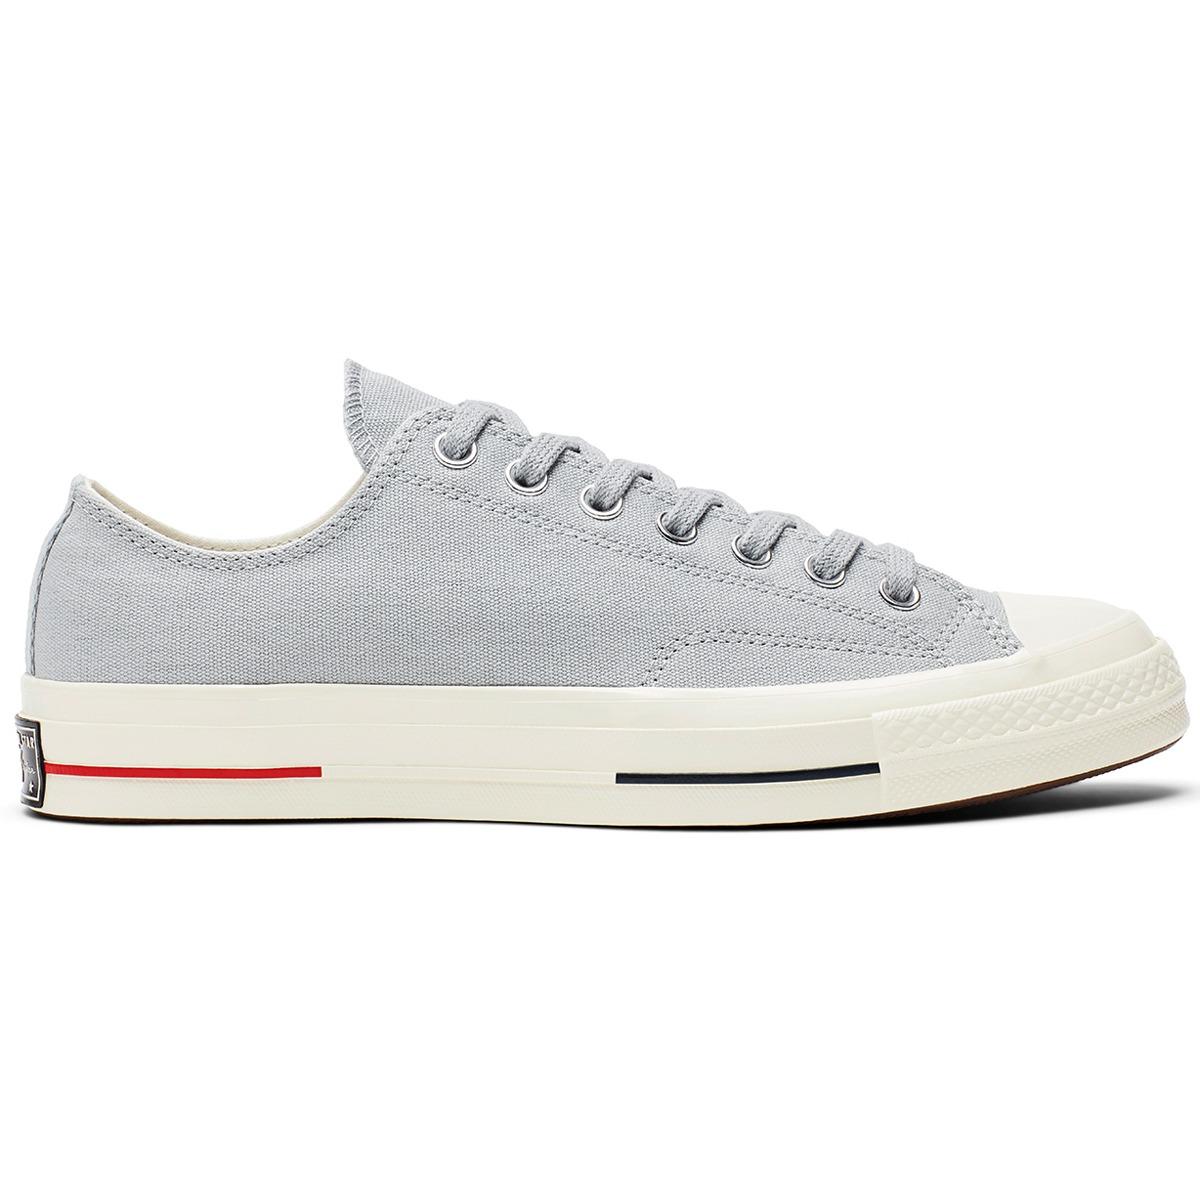 421c3016 zapatillas converse moda chuck taylor all star 70 hombre gr. Cargando zoom.